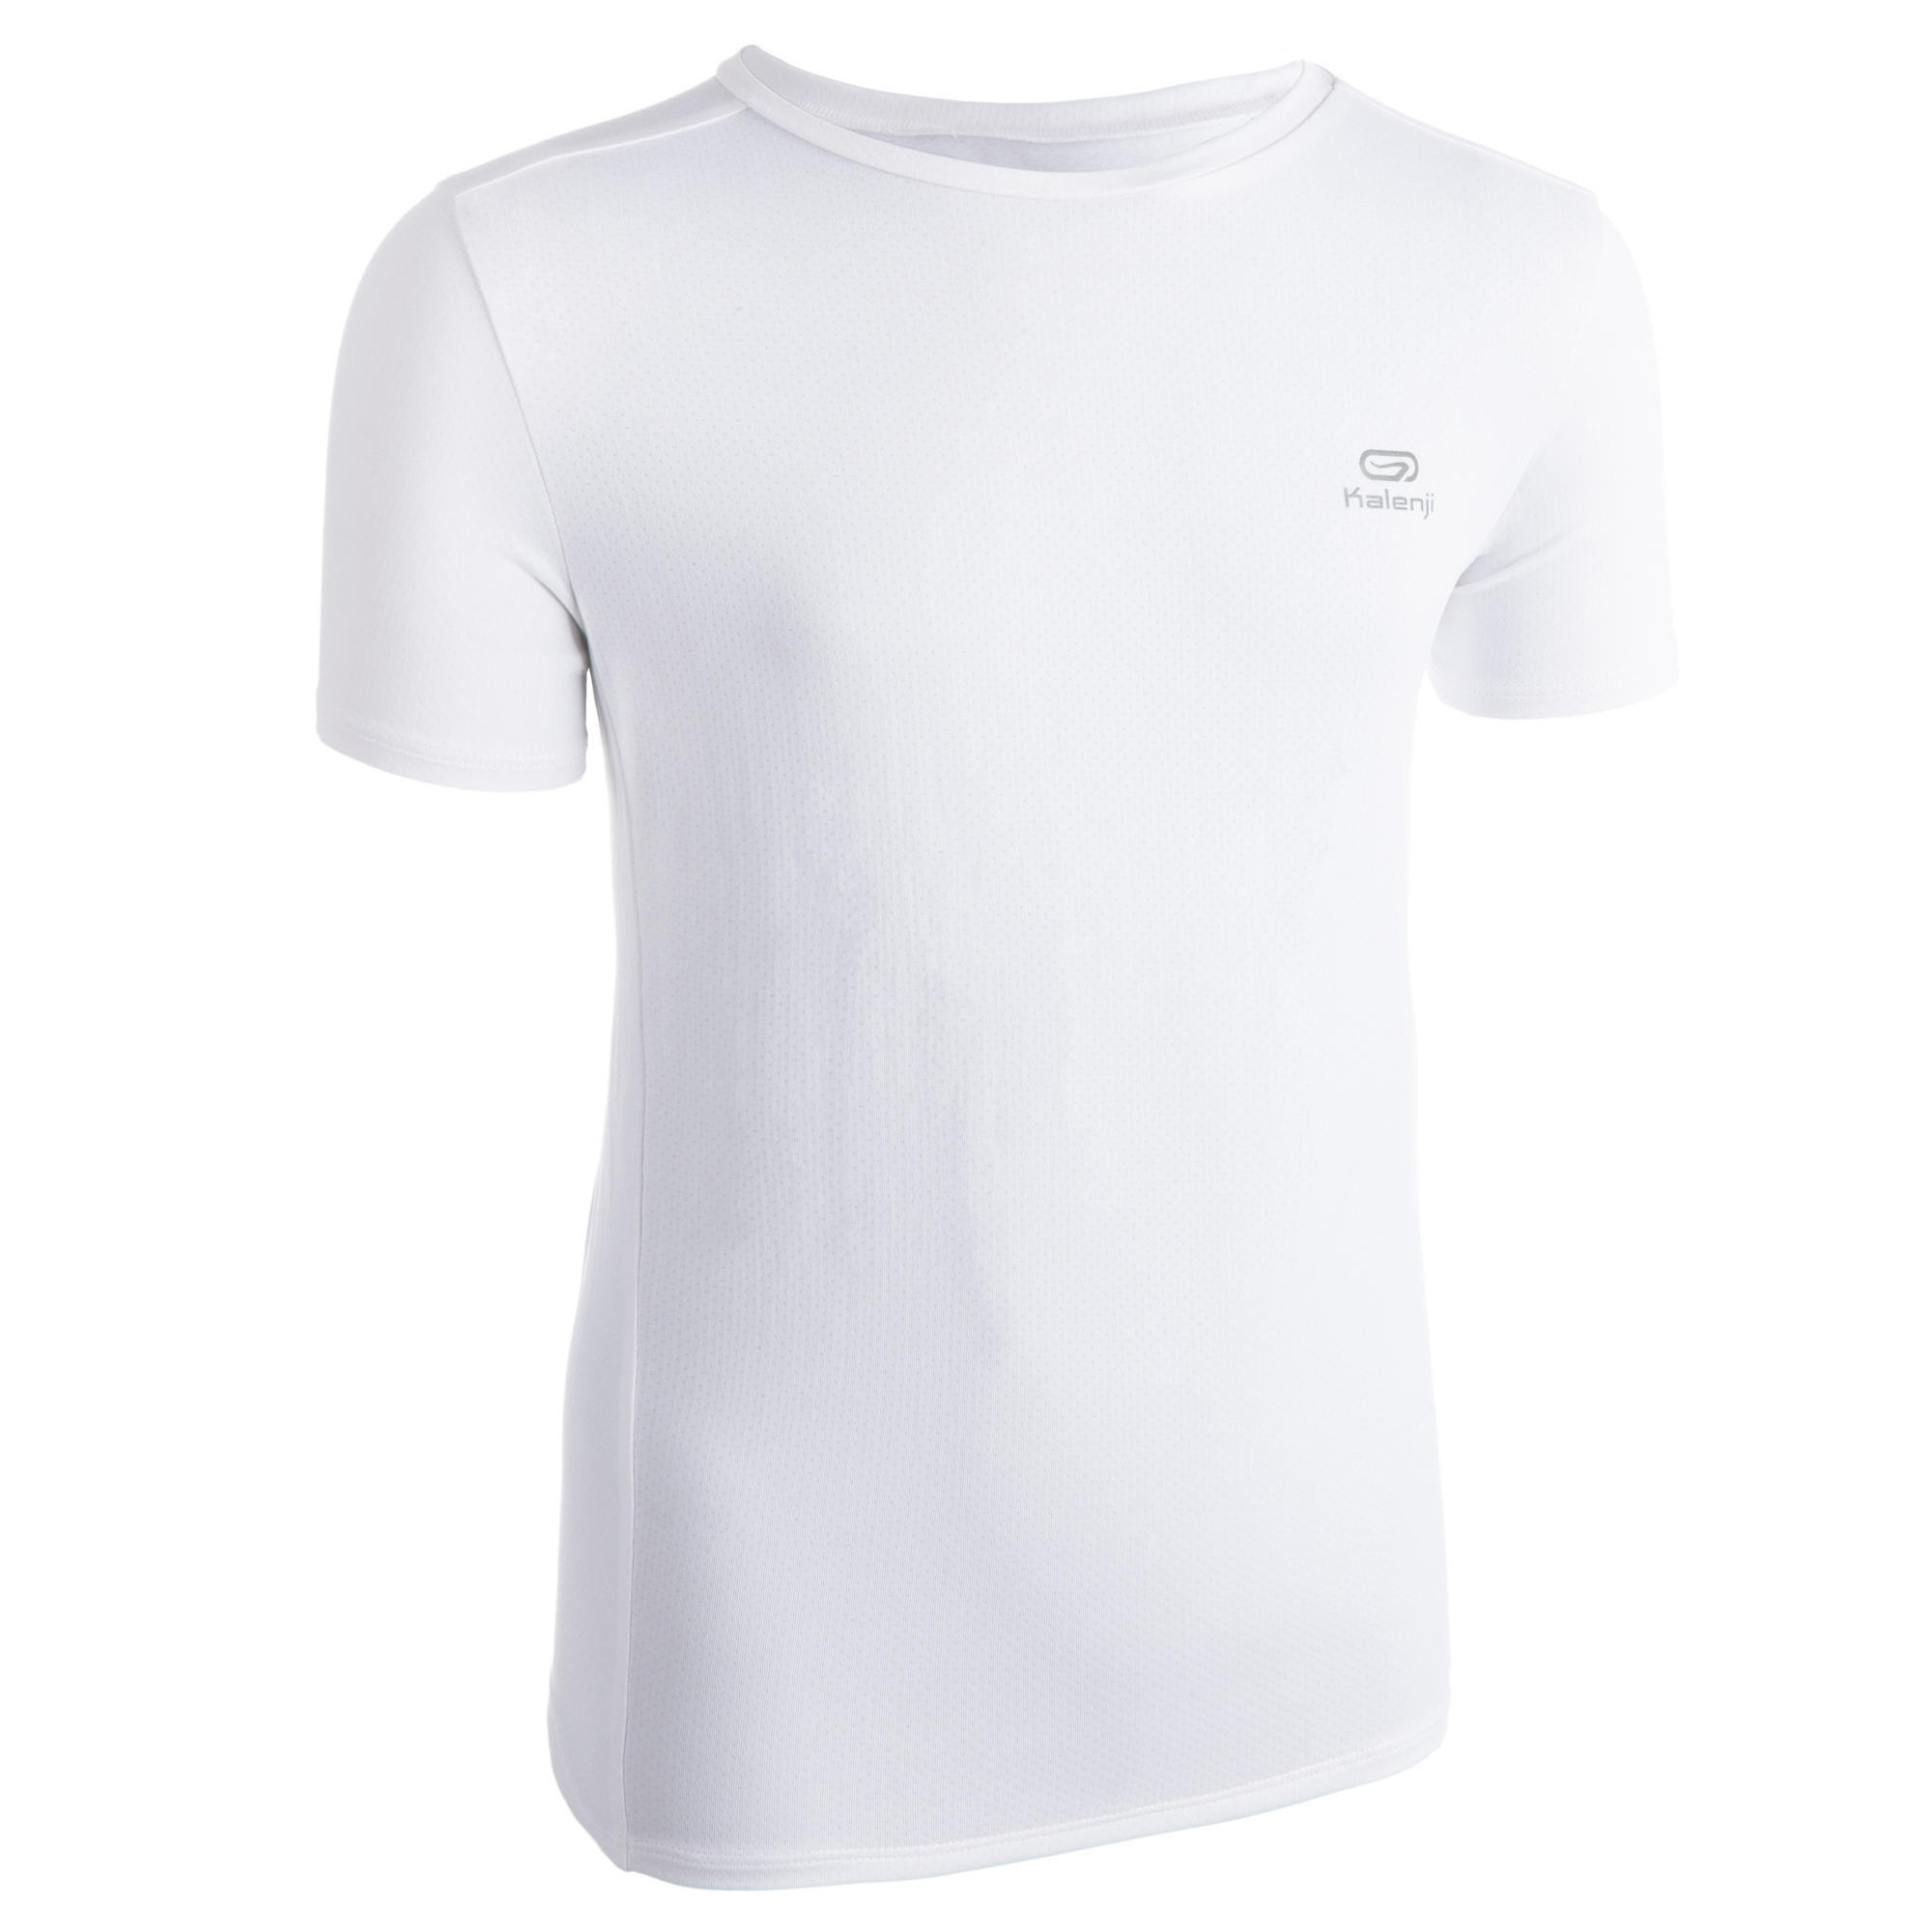 T-Shirt Leichtathletik AT100 atmungsaktiv Kinder weiss